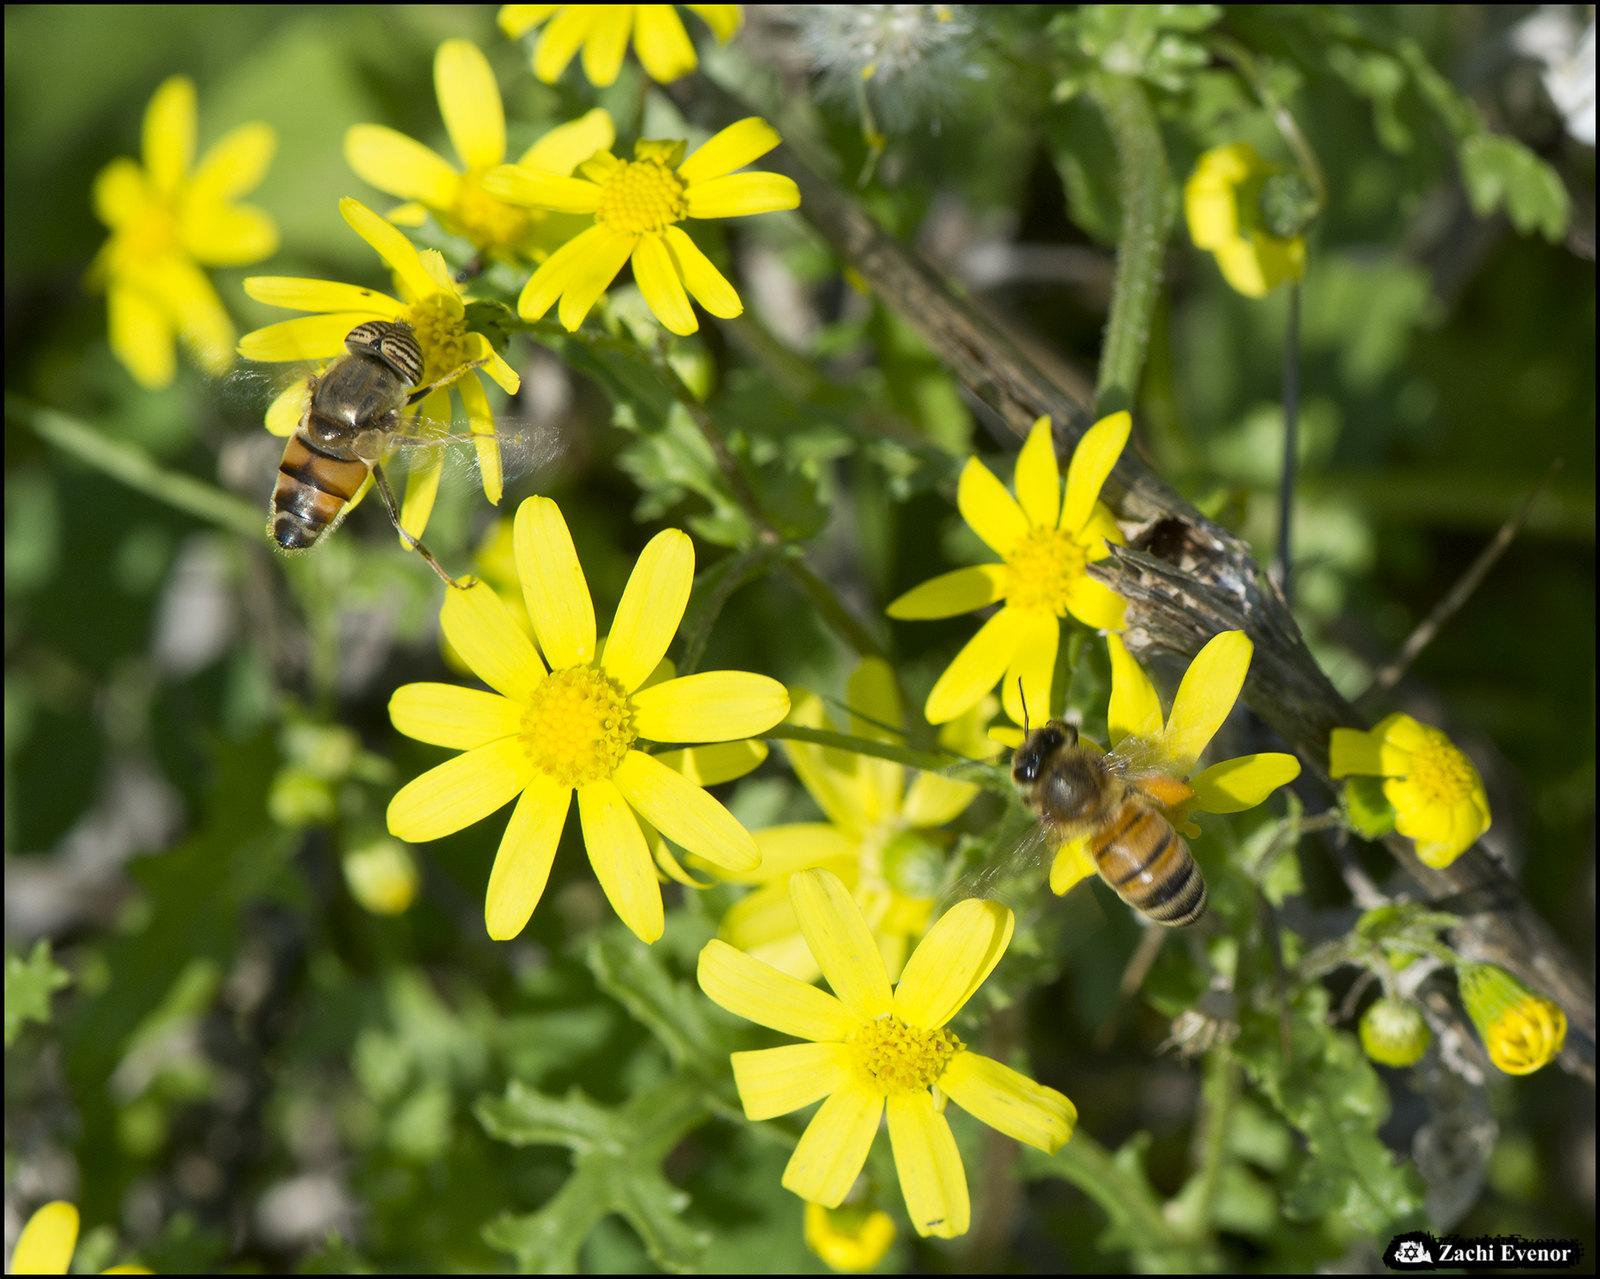 Honey Bee and Eristalinus taeniop - Rishon Flowers 2020-12-25 IZE-090